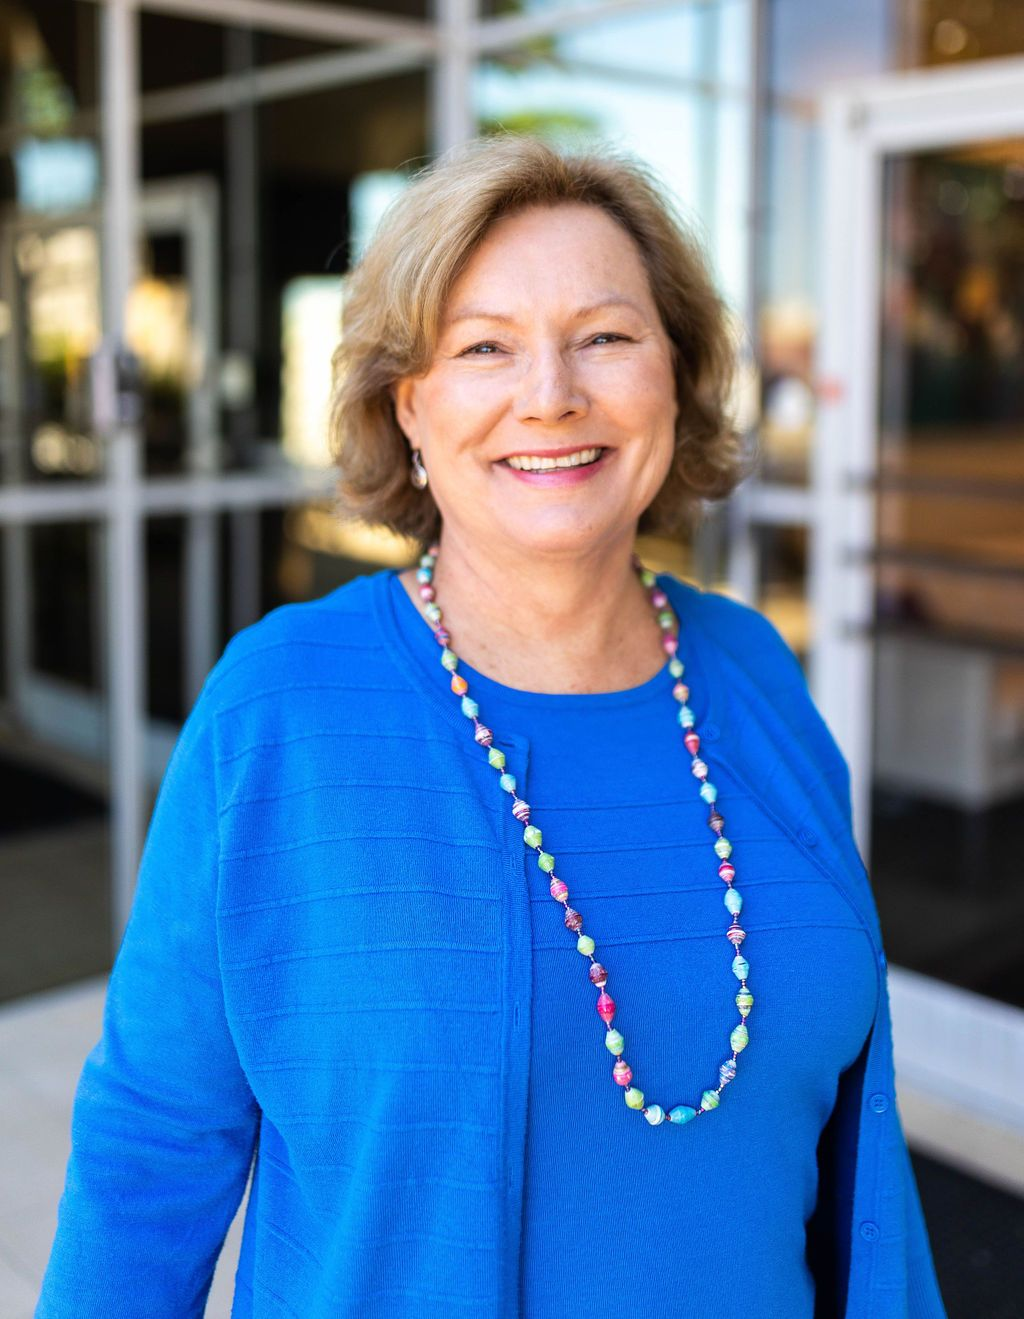 Kathy King, LICSW, PIP